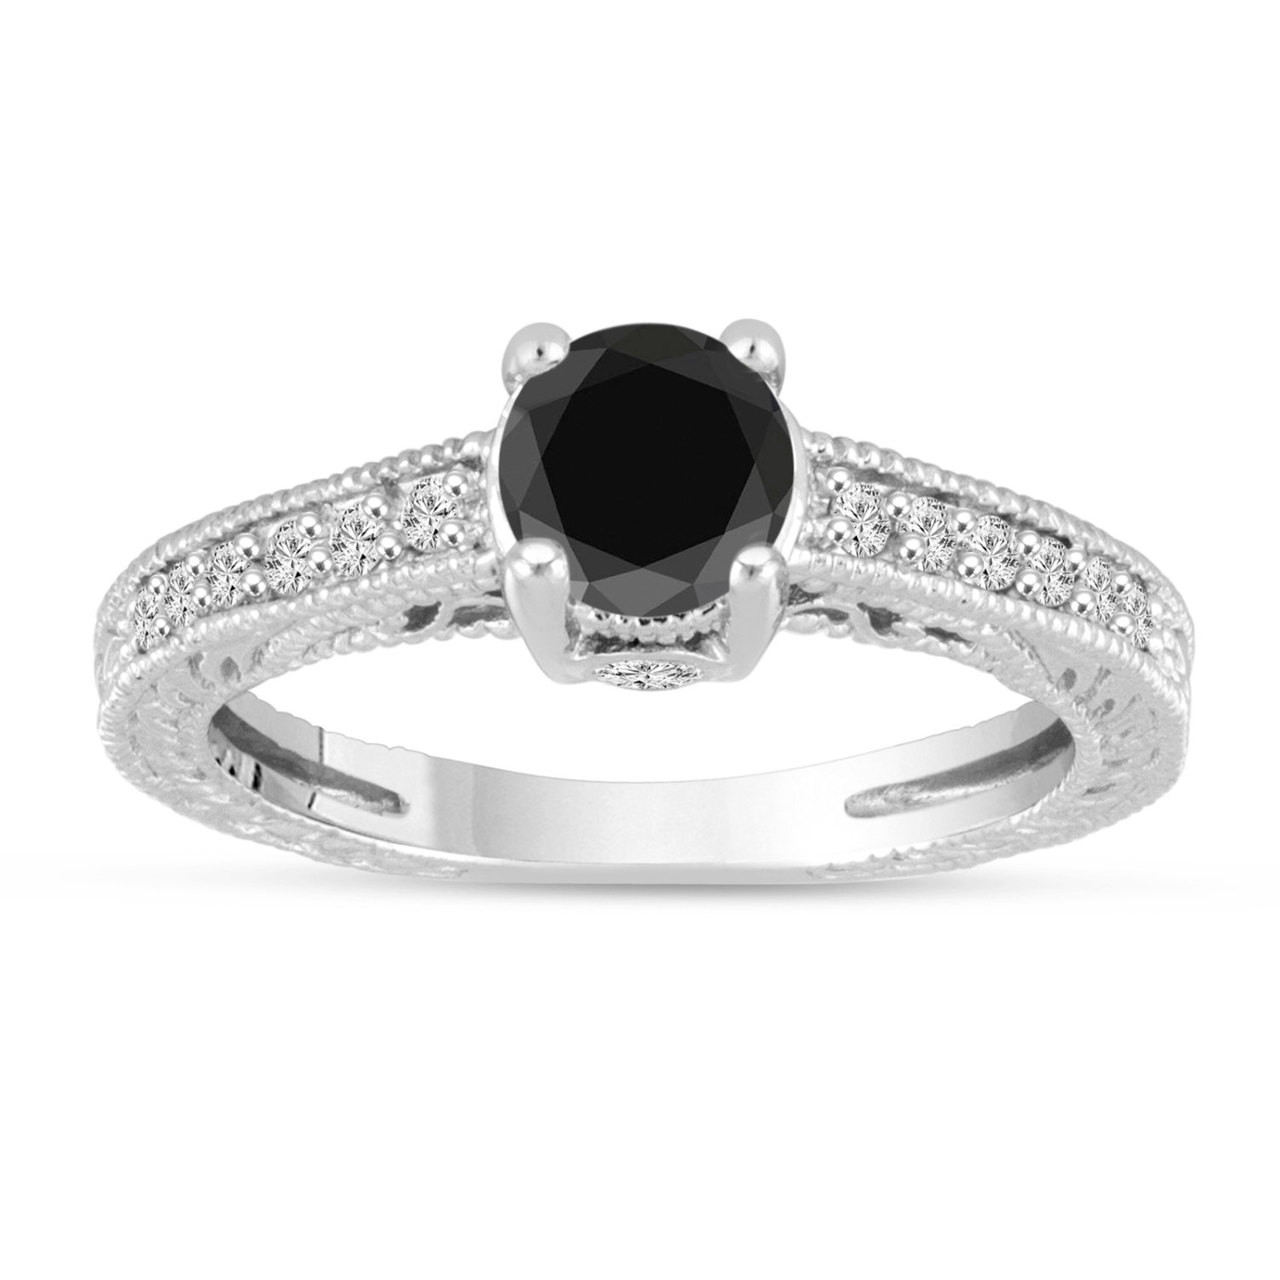 Antique Style 4 2mm Platinum Men S Wedding Band With: Black Diamond Engagement Ring 14K White Gold Vintage